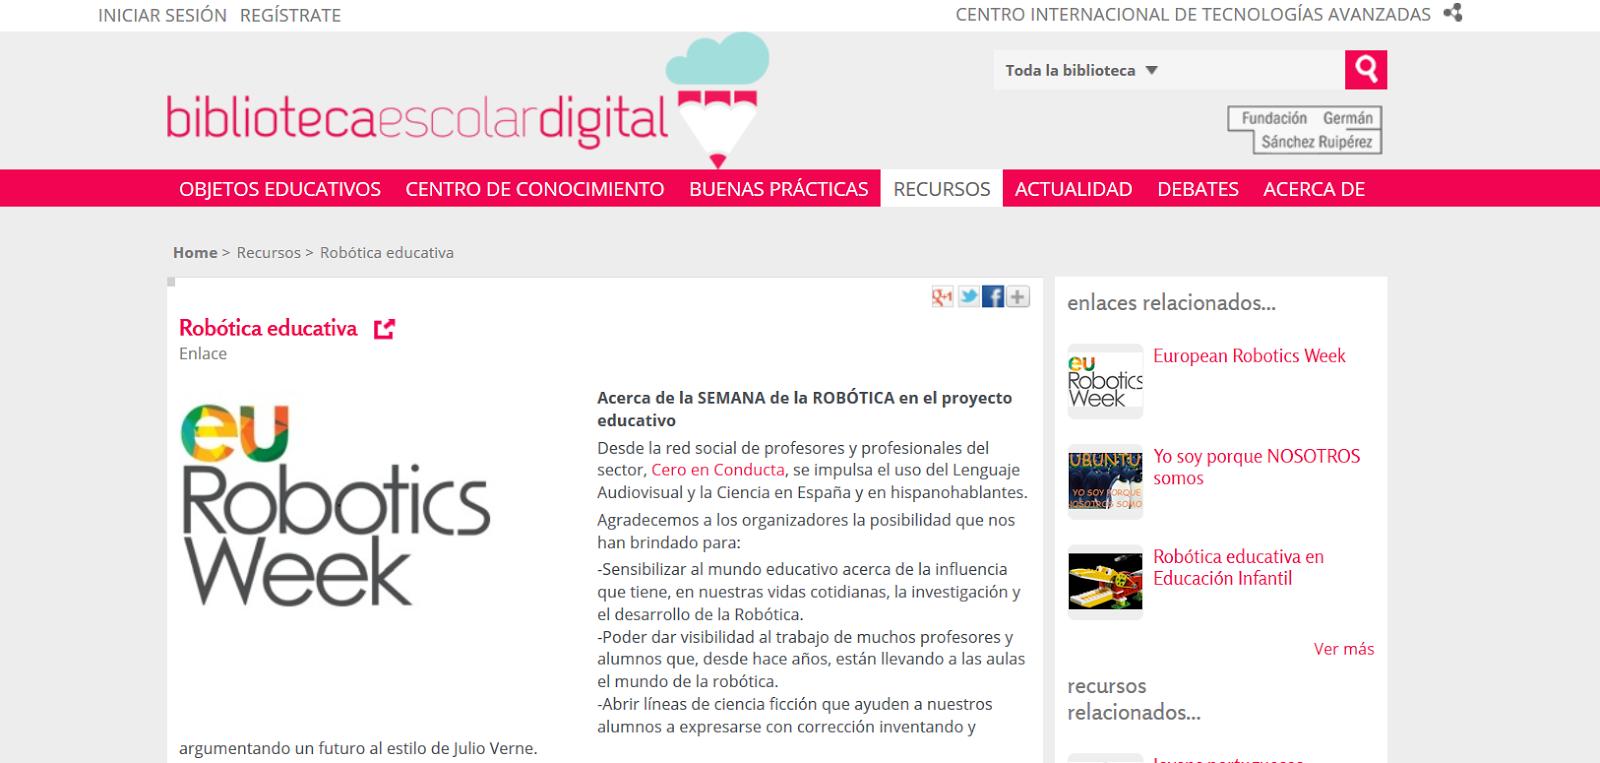 http://bibliotecaescolardigital.es/comunidad/BibliotecaEscolarDigital/recurso/robotica-educativa/cff9eda0-2684-4700-a1ce-02dfec3a2342